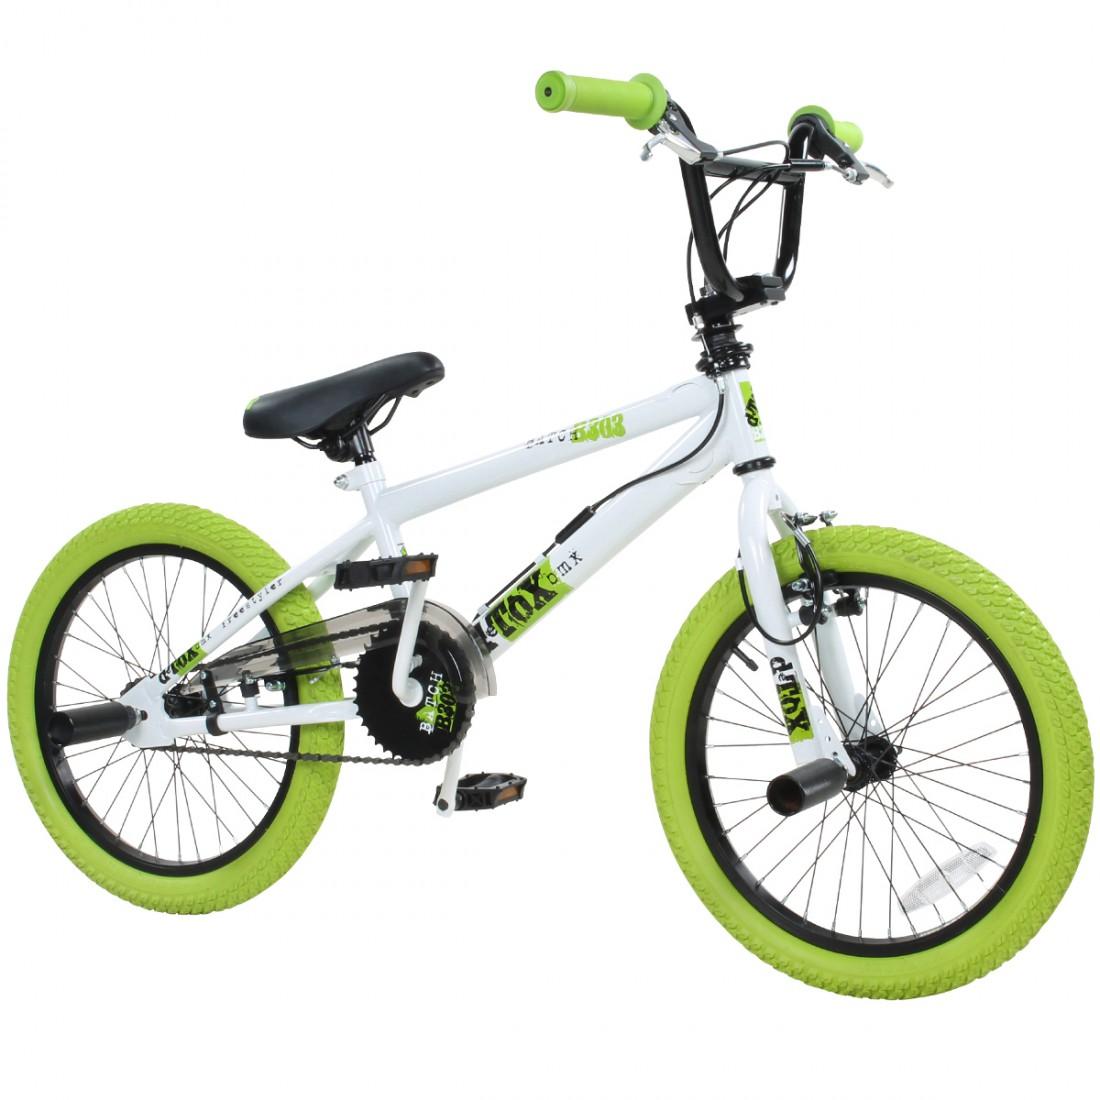 18 pouces bmx bike velo freestyle bicyclette v lo d 39 enfants enfant jeunes detox ebay. Black Bedroom Furniture Sets. Home Design Ideas